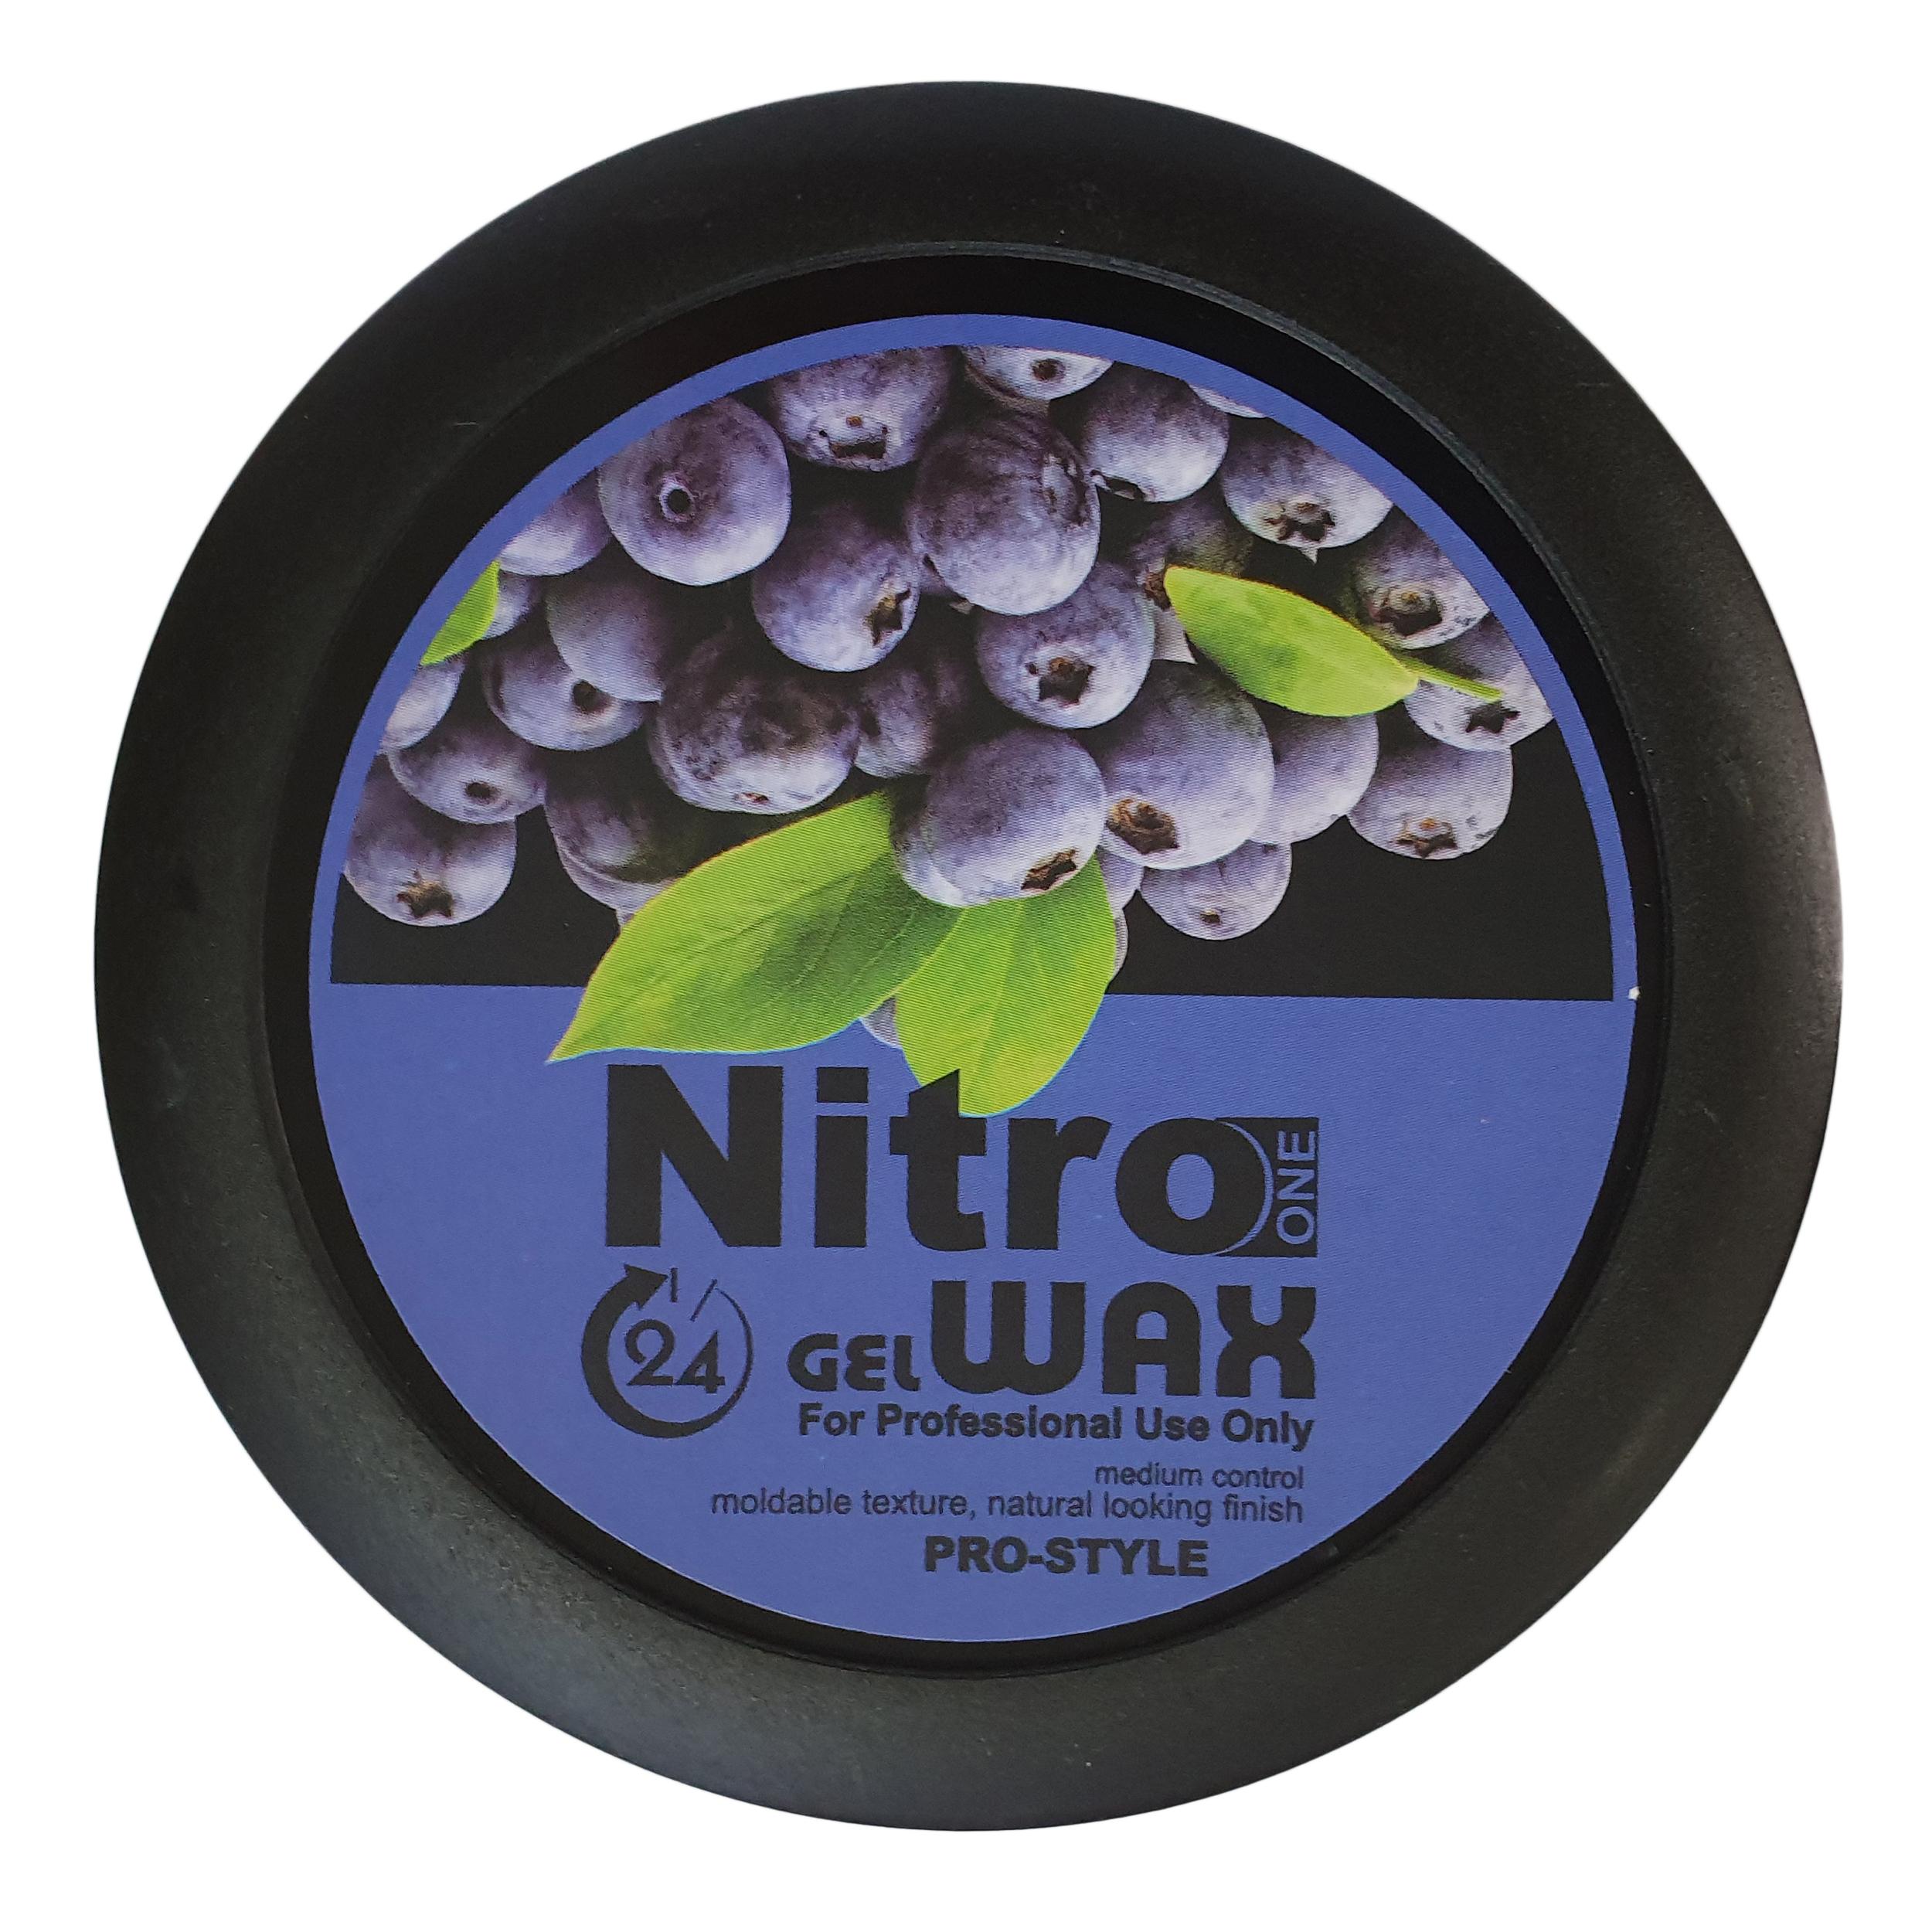 چسب مو نیترو مدل bluberry حجم 175 میلی لیتر